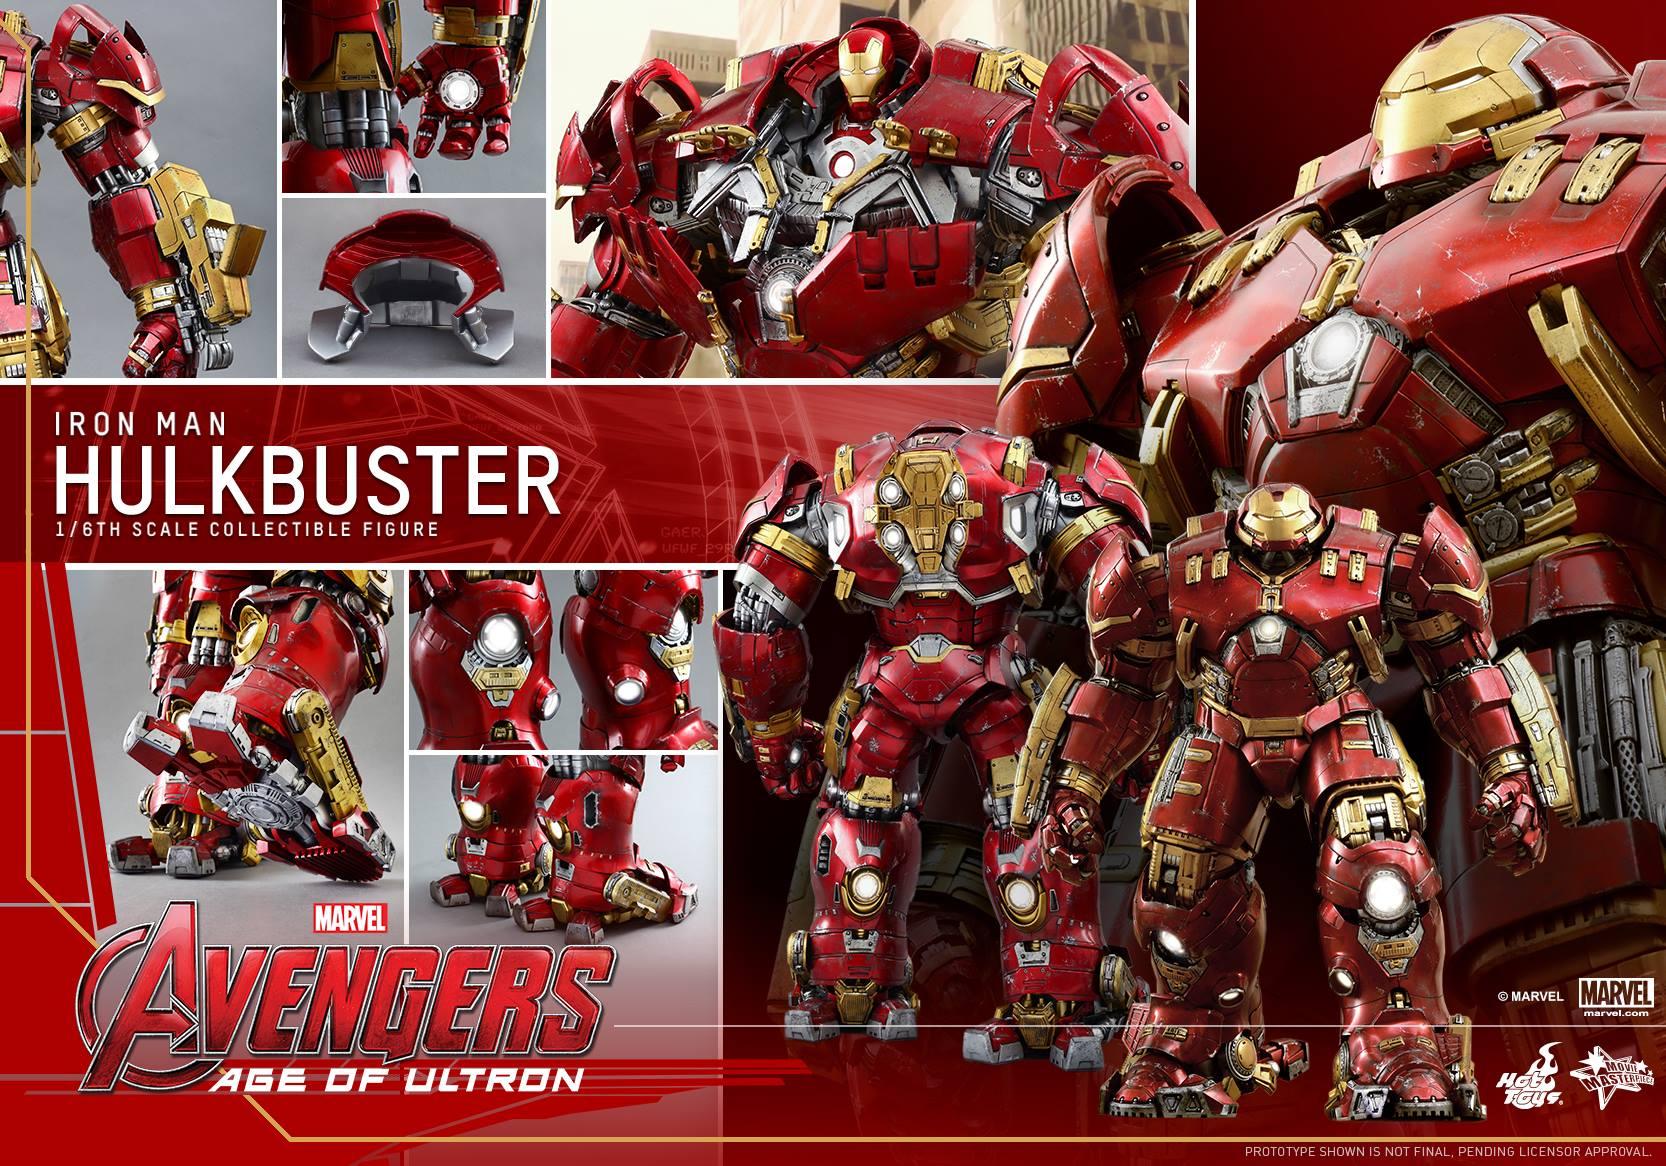 http://i2.wp.com/www.slashfilm.com/wp/wp-content/images/Hot-Toys-Avengers-Hulkbuster-20.jpg?fit=3000%2C3000